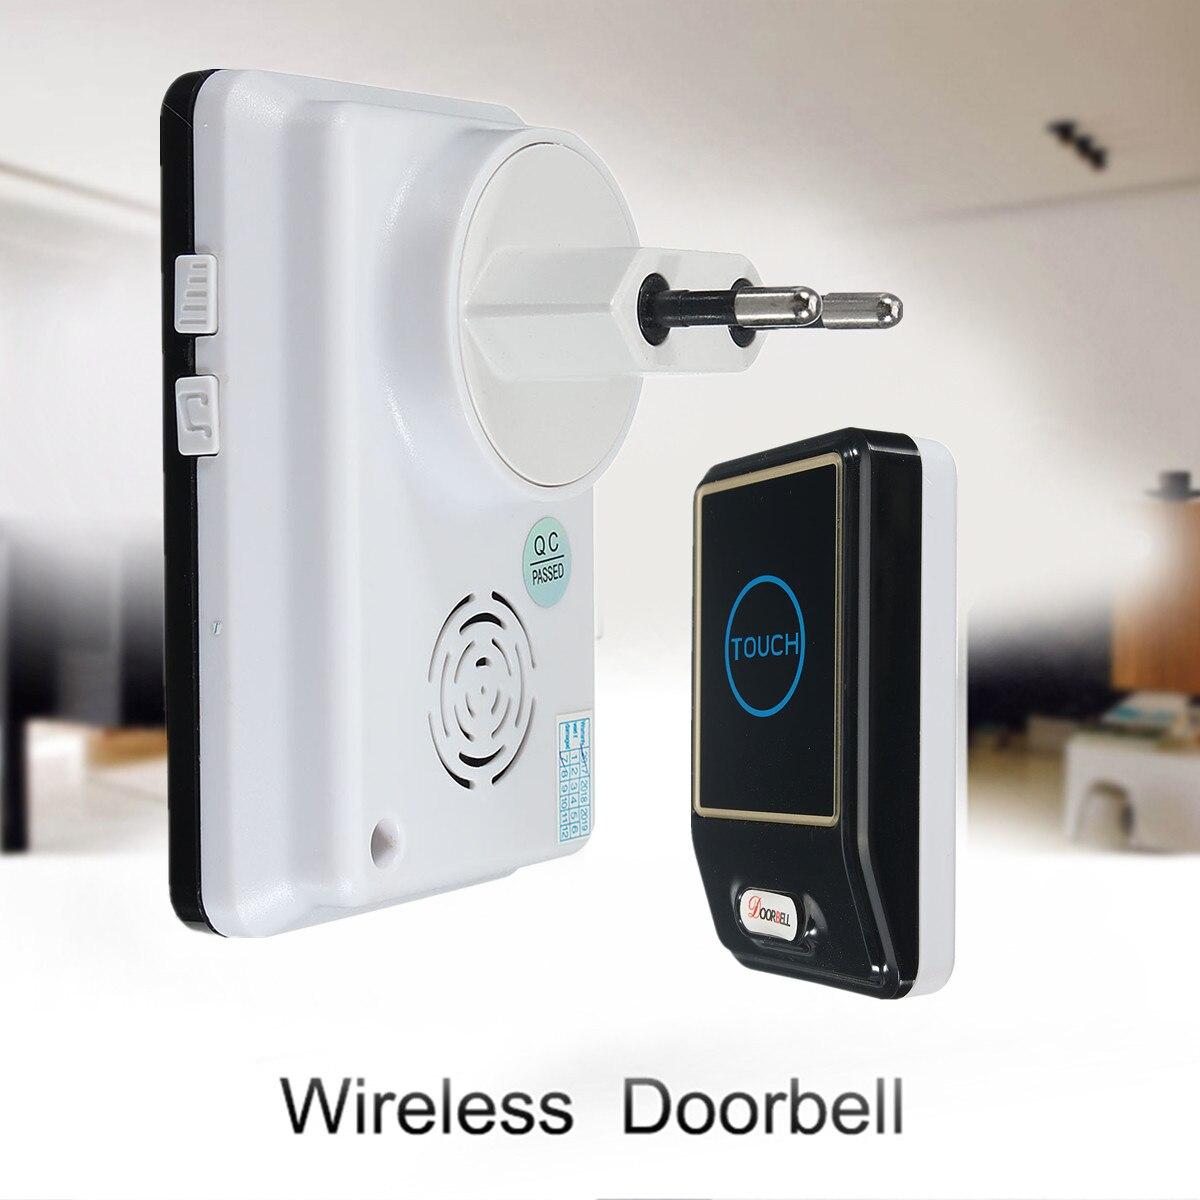 Safurance Waterproof Intelligent Doorbell Wireless Remote Smart Touch Door Bell 28 Melody Waterproof Home Security home wireless smart doorbell security